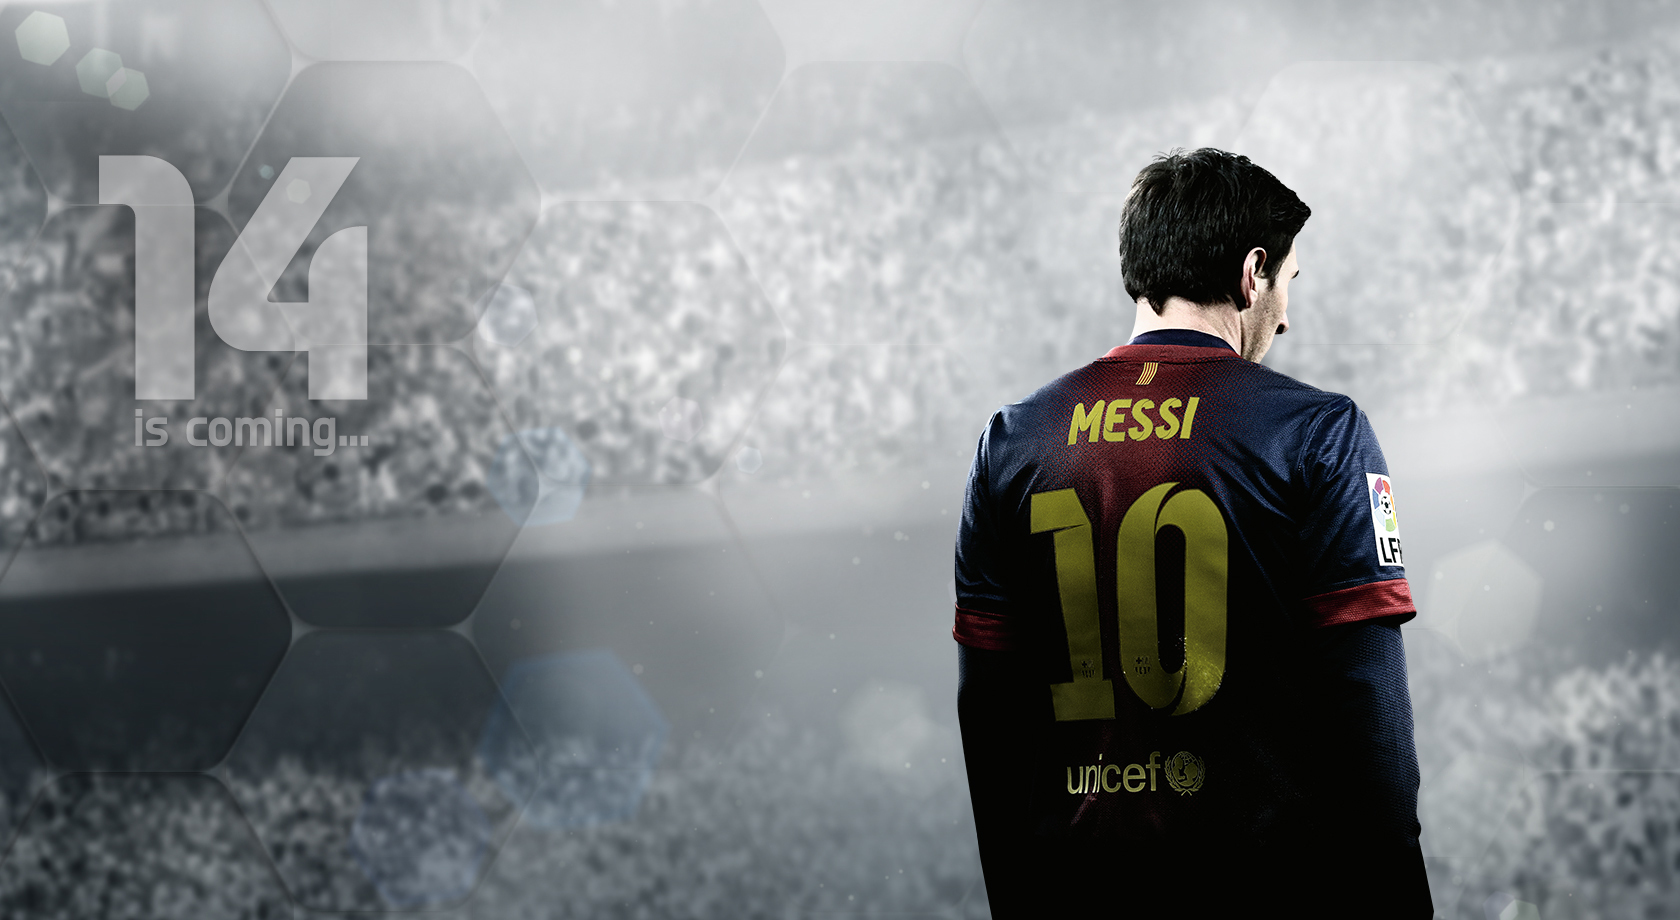 FIFA 14 Announcement Tomorrow